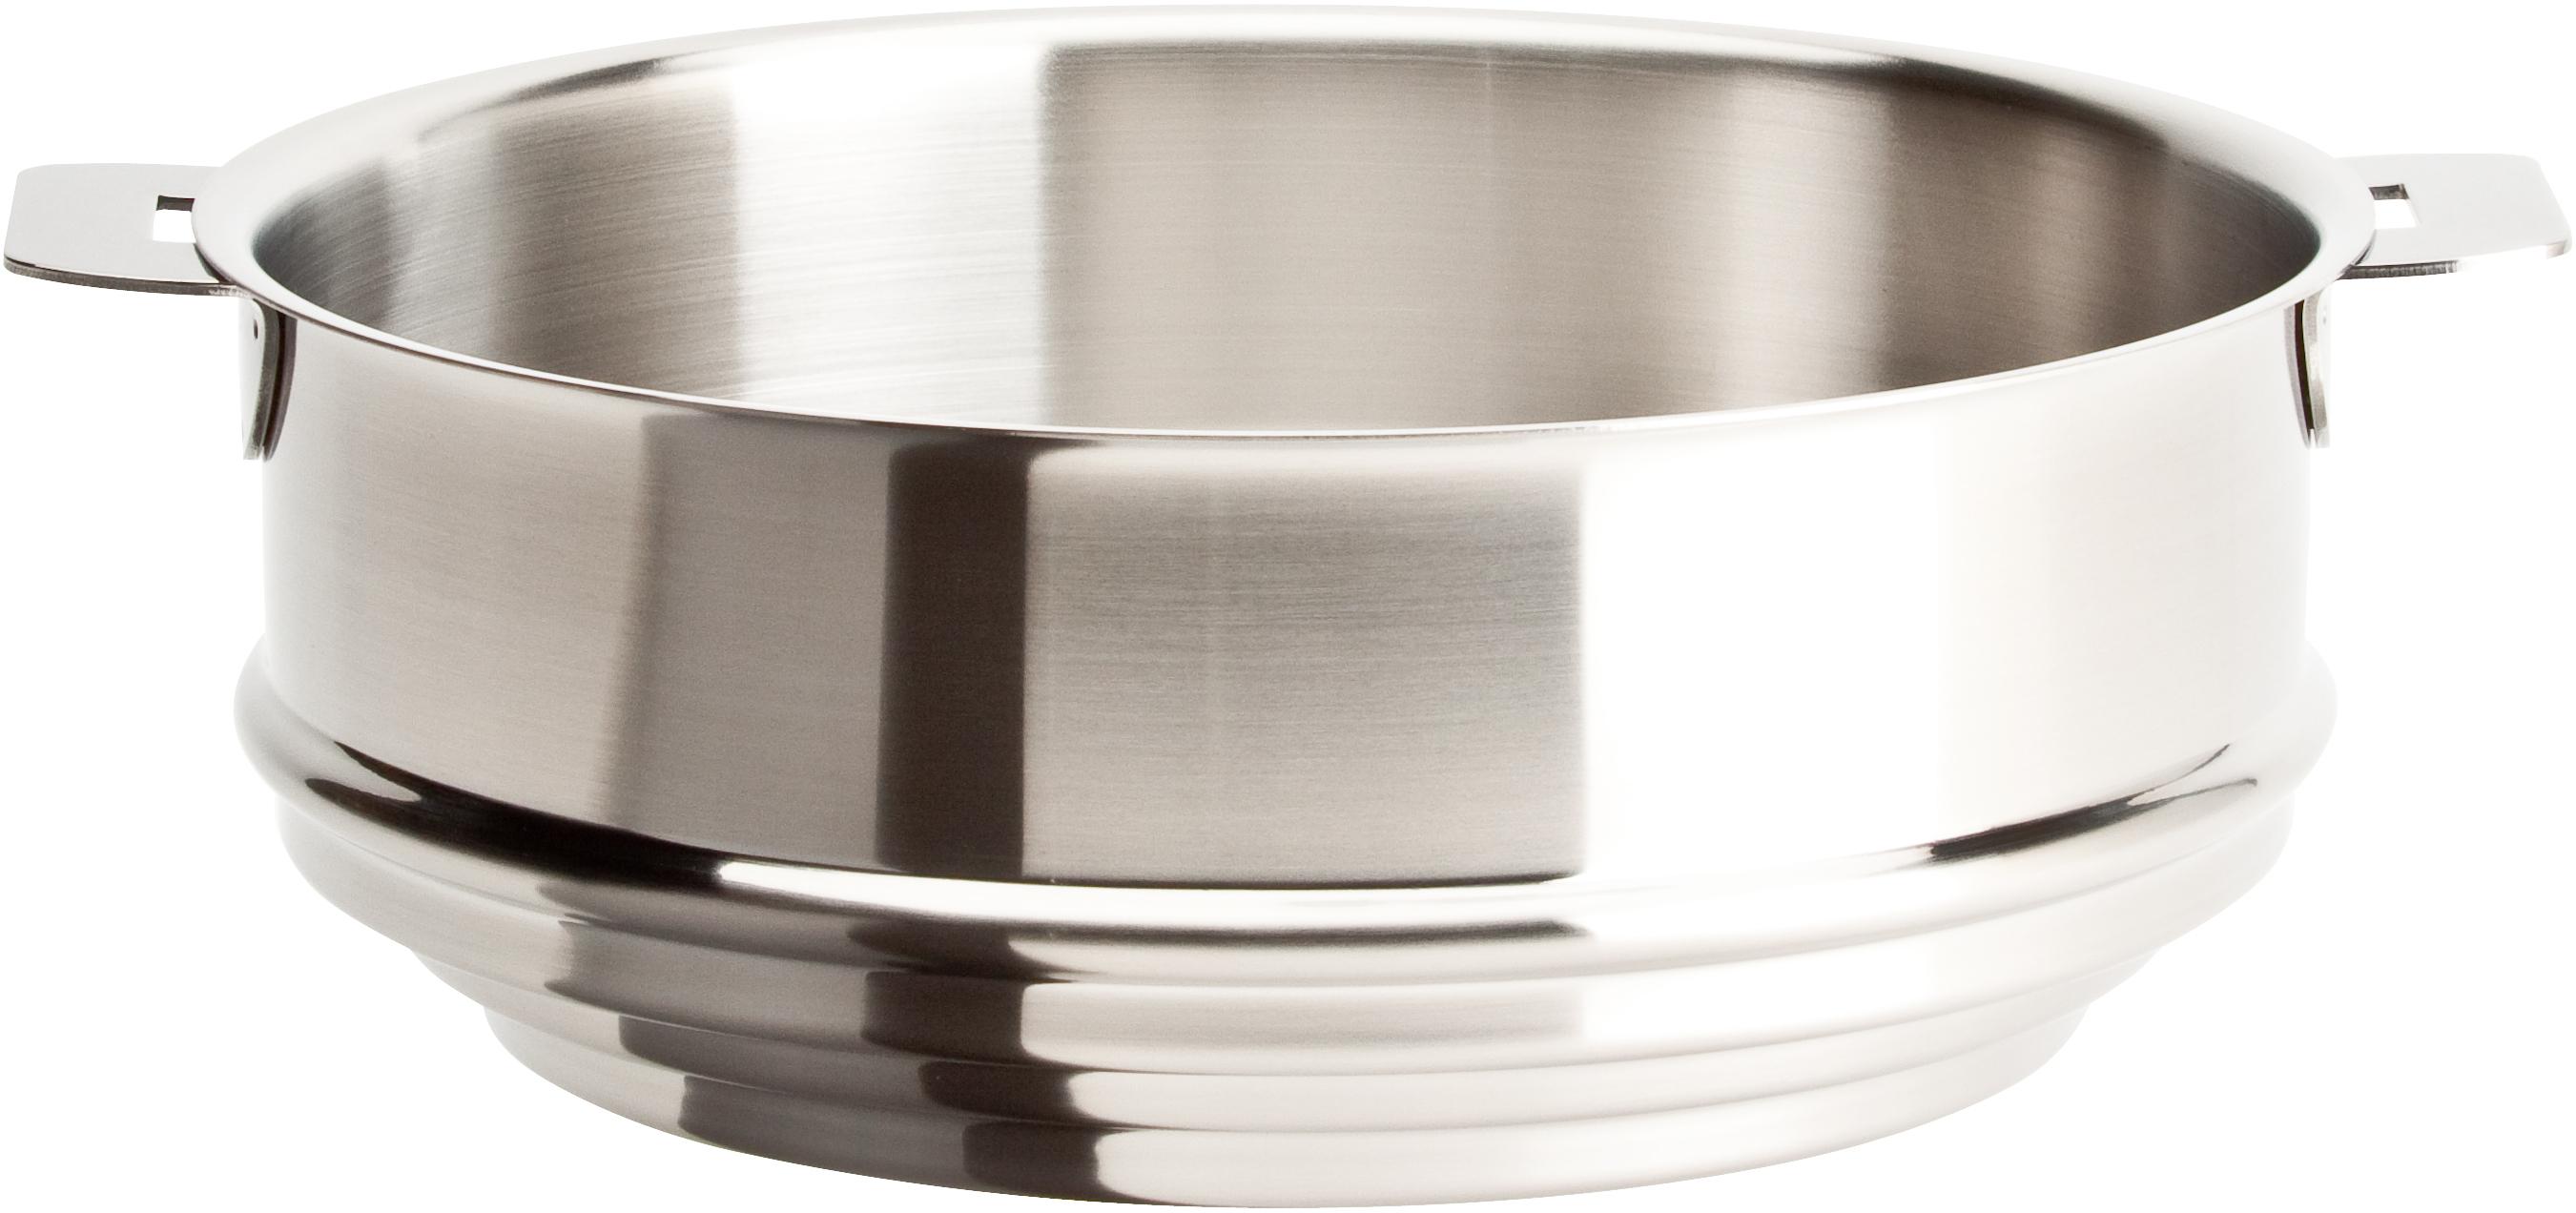 Cristel Strate L Stainless Steel 9.5 Inch Universal Steamer Insert